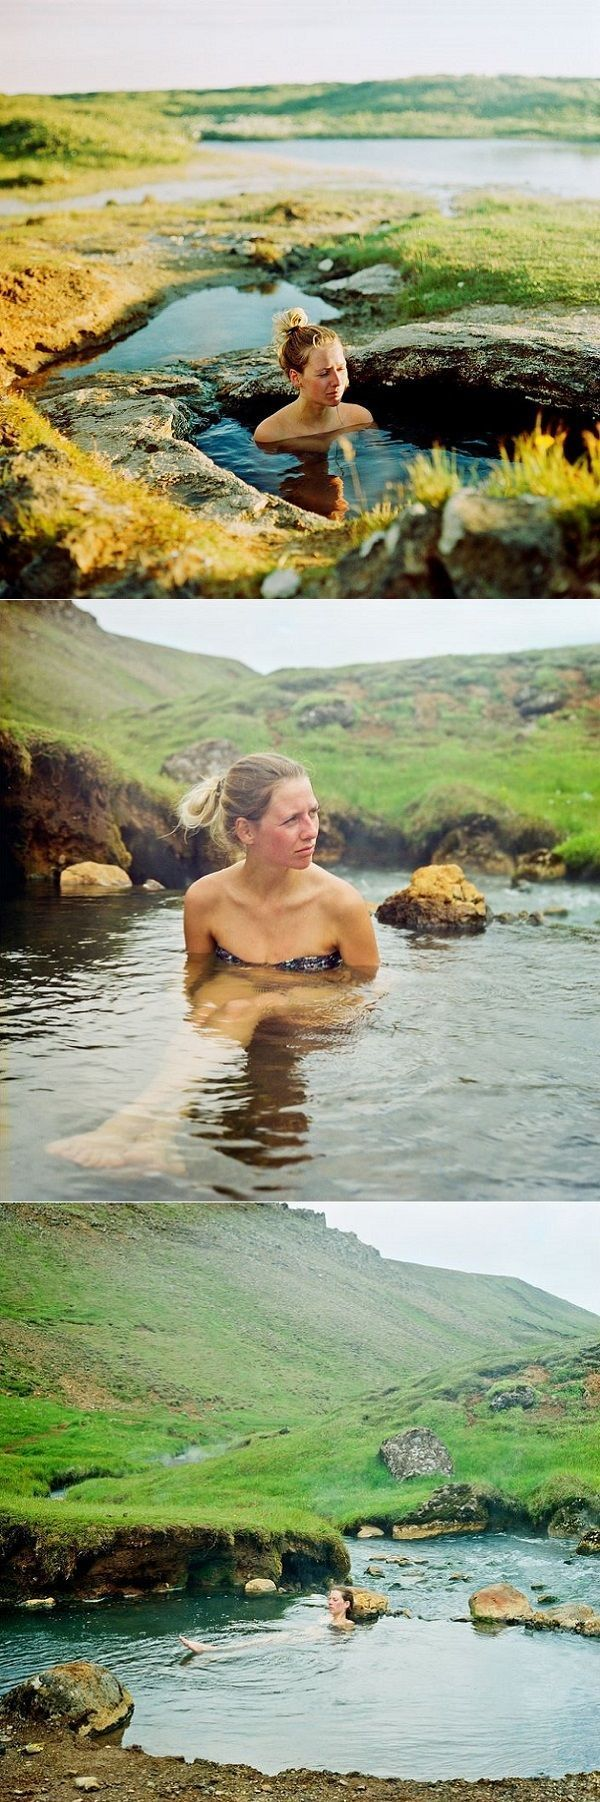 Romantic Icelandic spot: Landbrotalaug hot pot